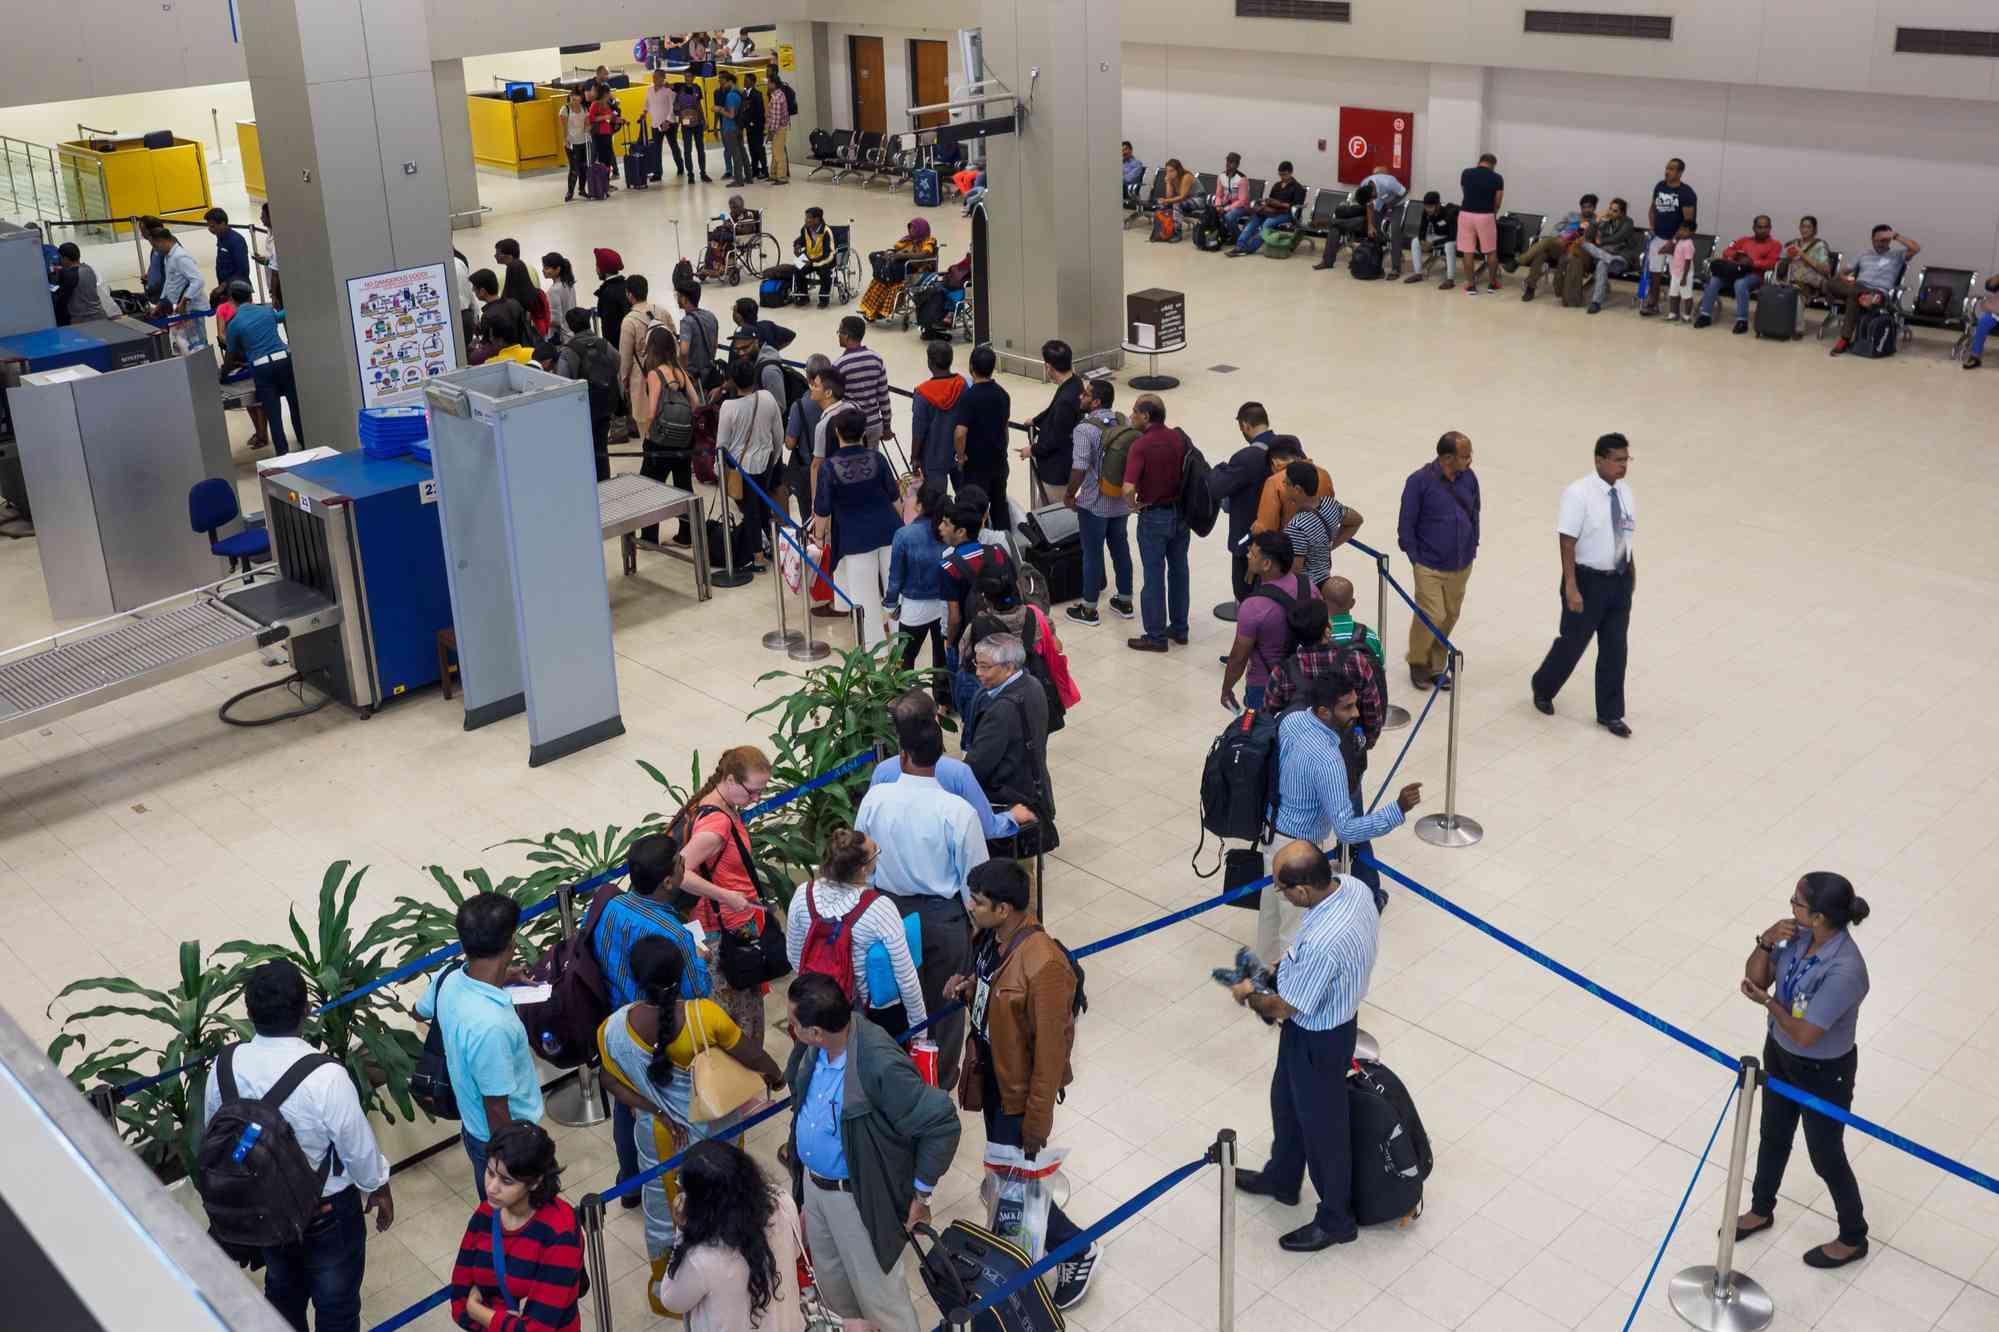 Passengers waiting in the queue for security check at Sri Lanka Bandaranaike International Airport